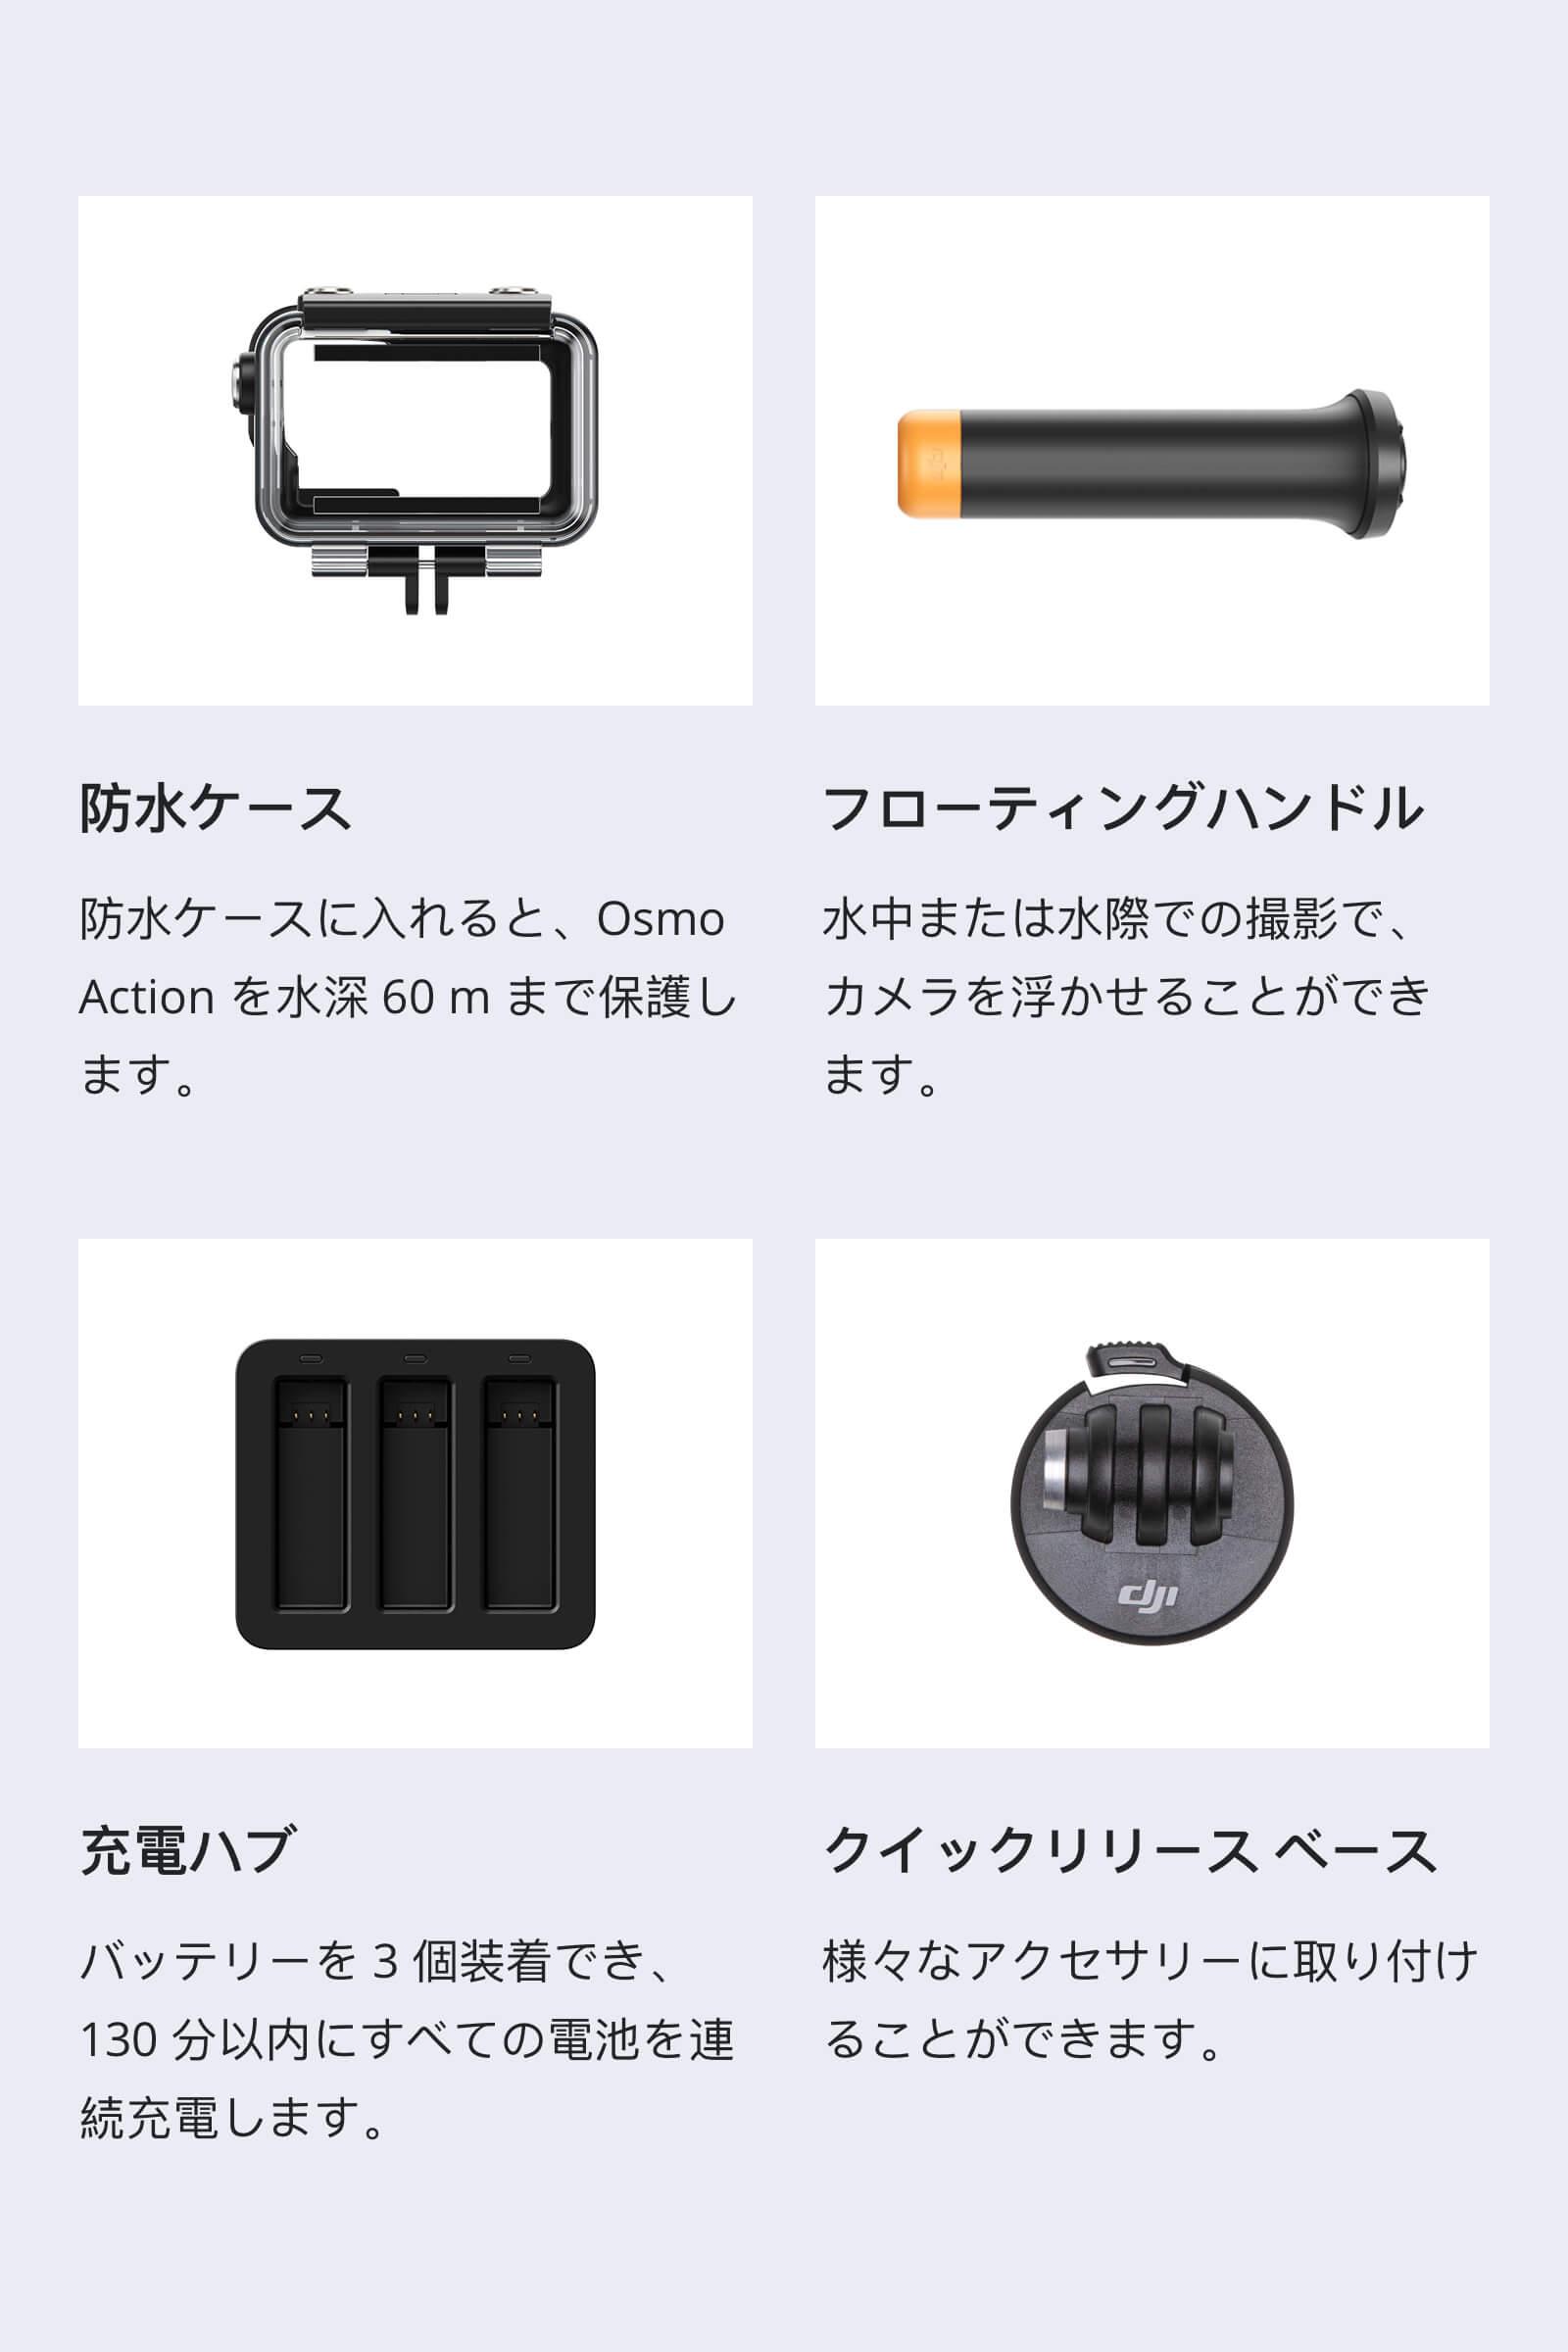 https://www.drone-station.net/images/DJI/osmoaction/20action.jpg